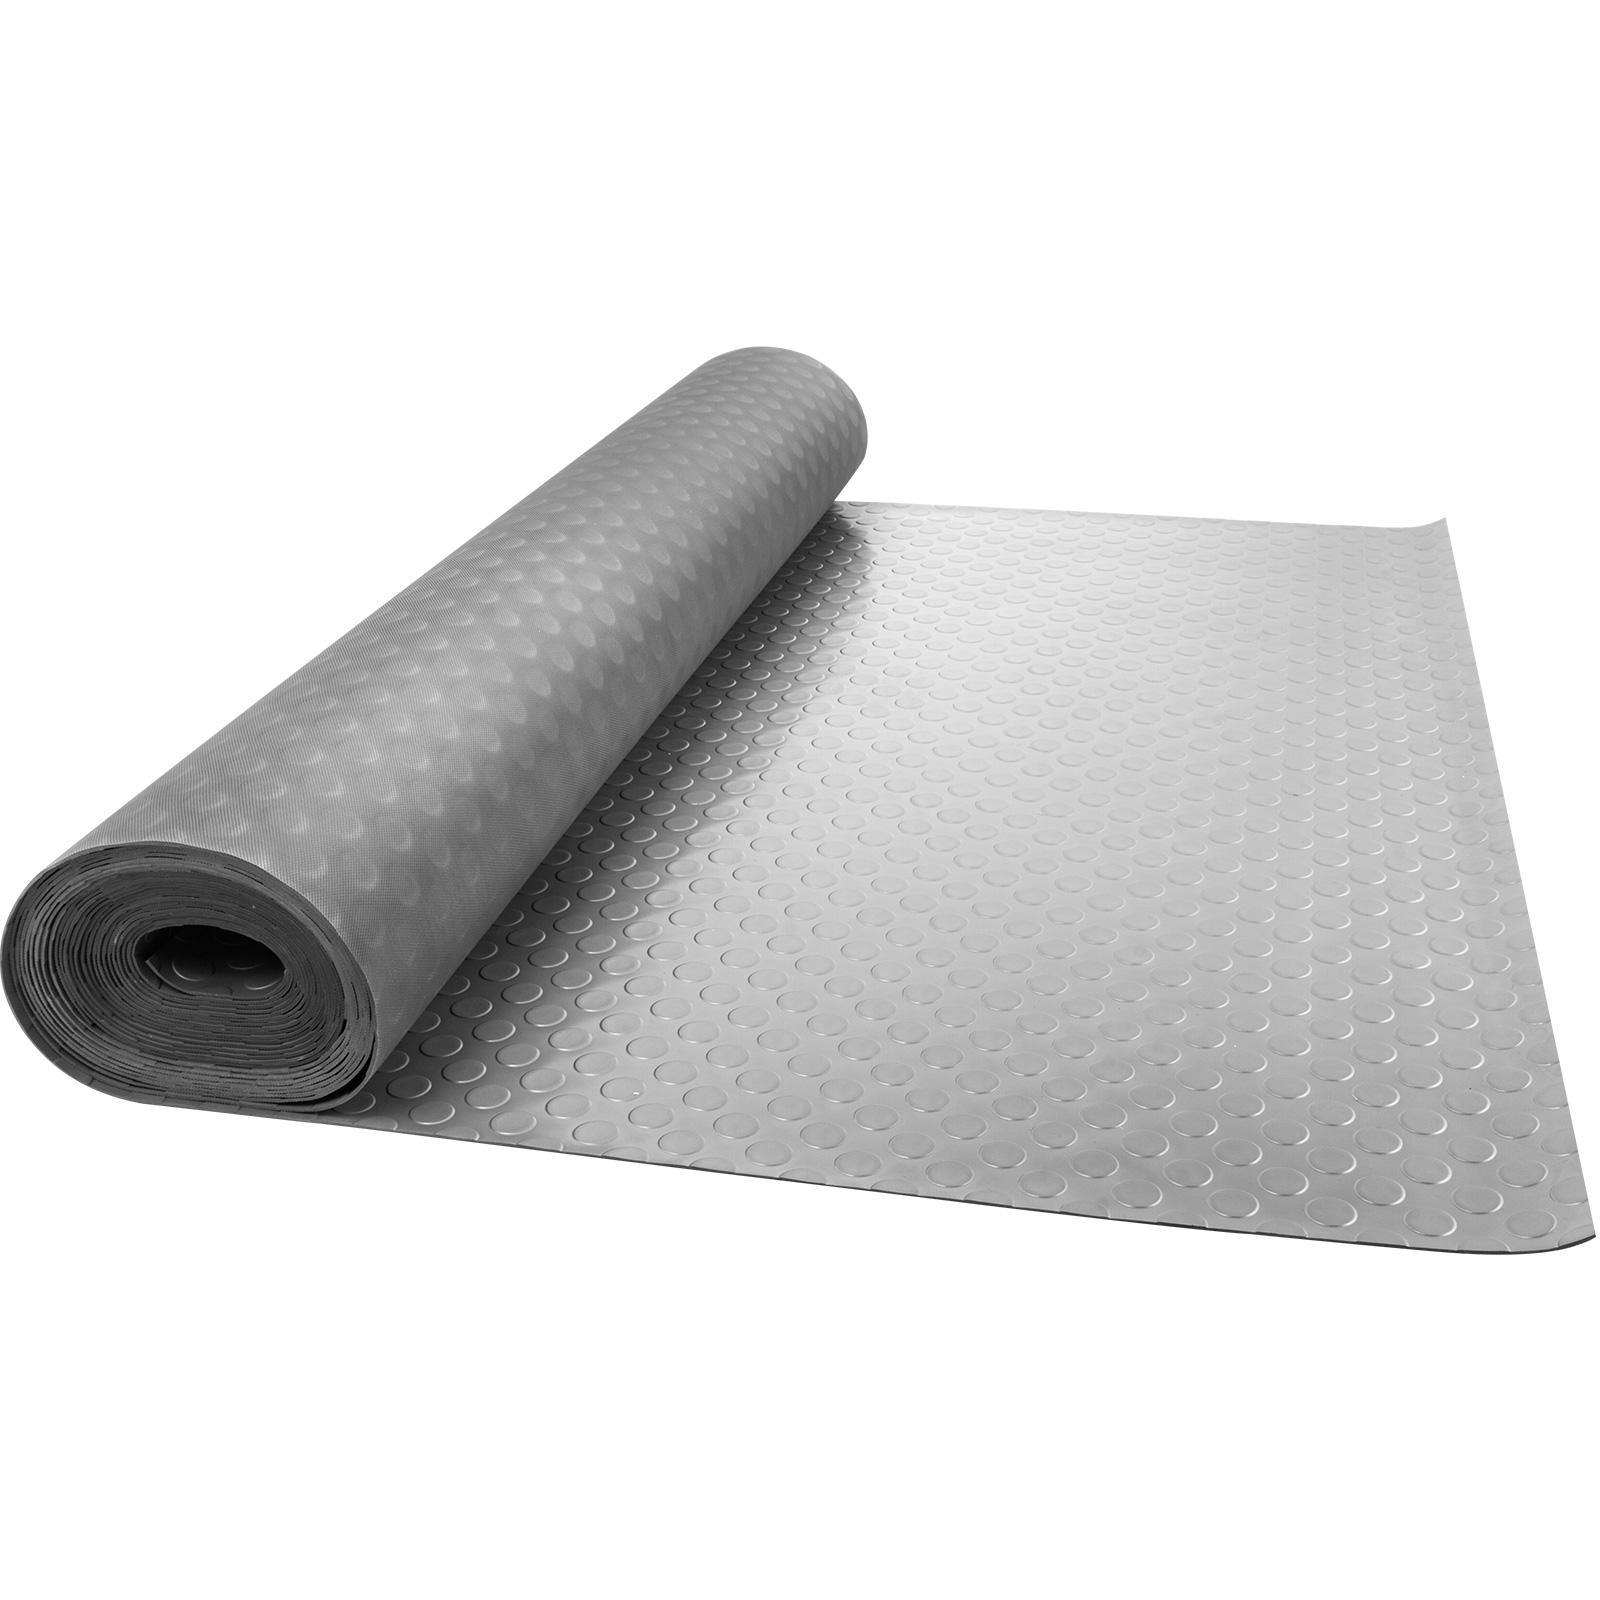 thumbnail 143 - Garage Flooring Mat Roll Car Trailer Floor Covering 1.1m Width Gym Floor Roll